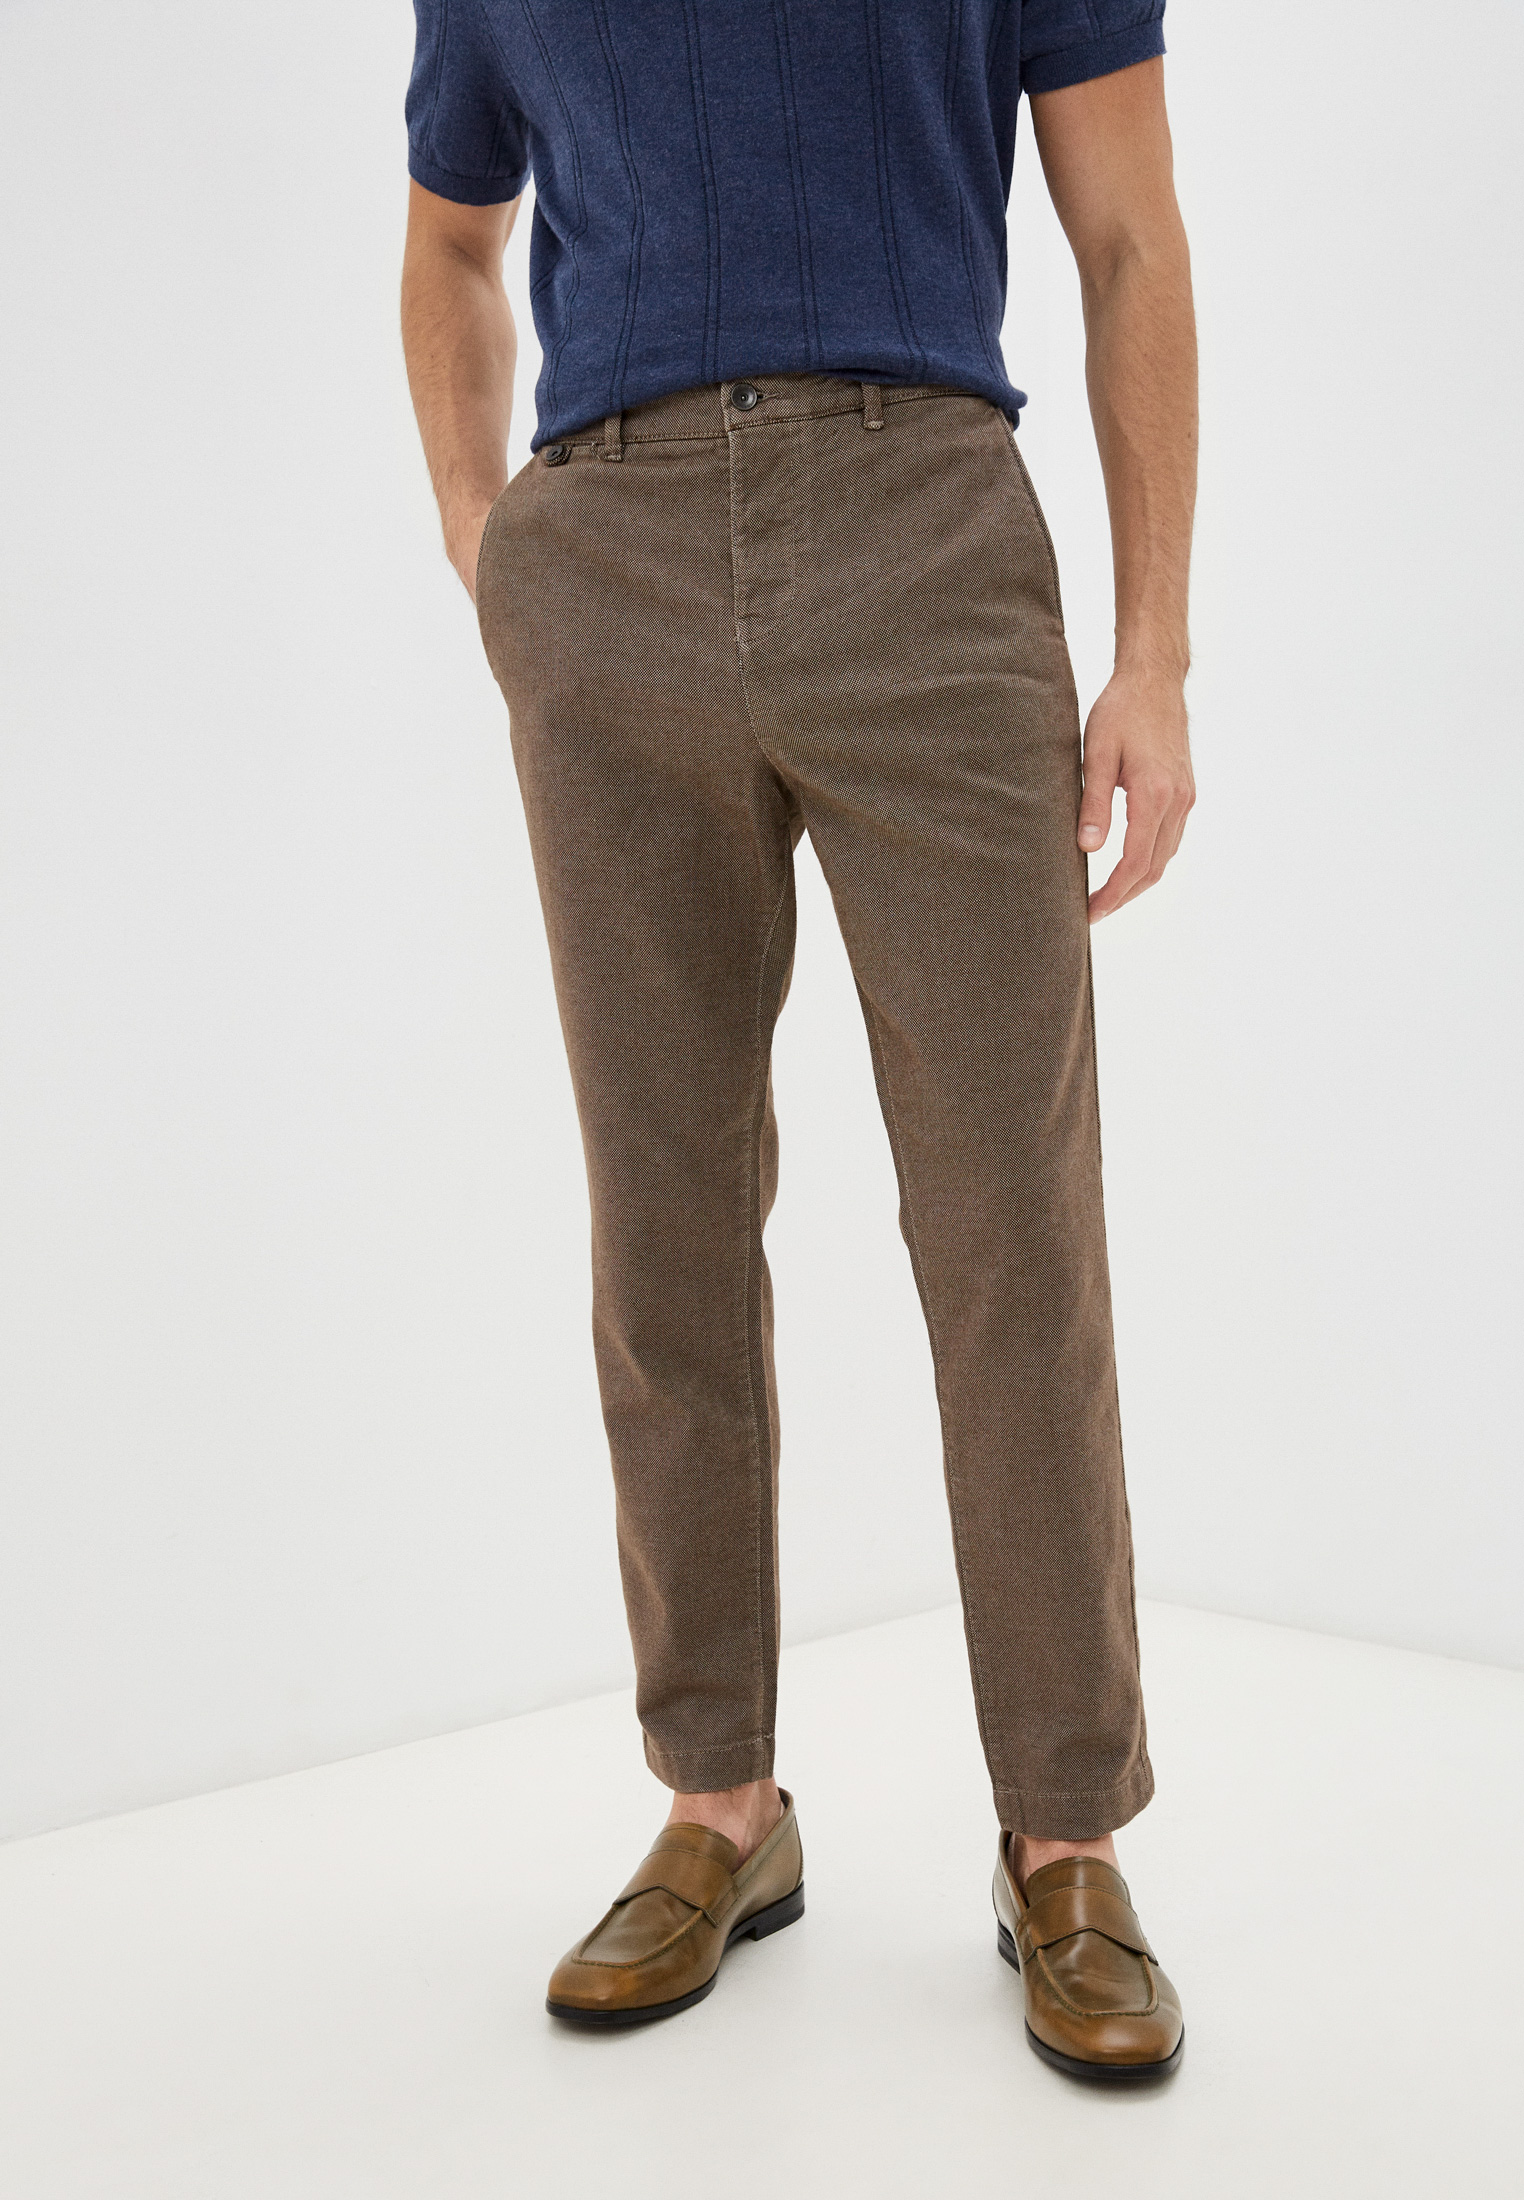 Мужские зауженные брюки United Colors of Benetton (Юнайтед Колорс оф Бенеттон) Брюки United Colors of Benetton